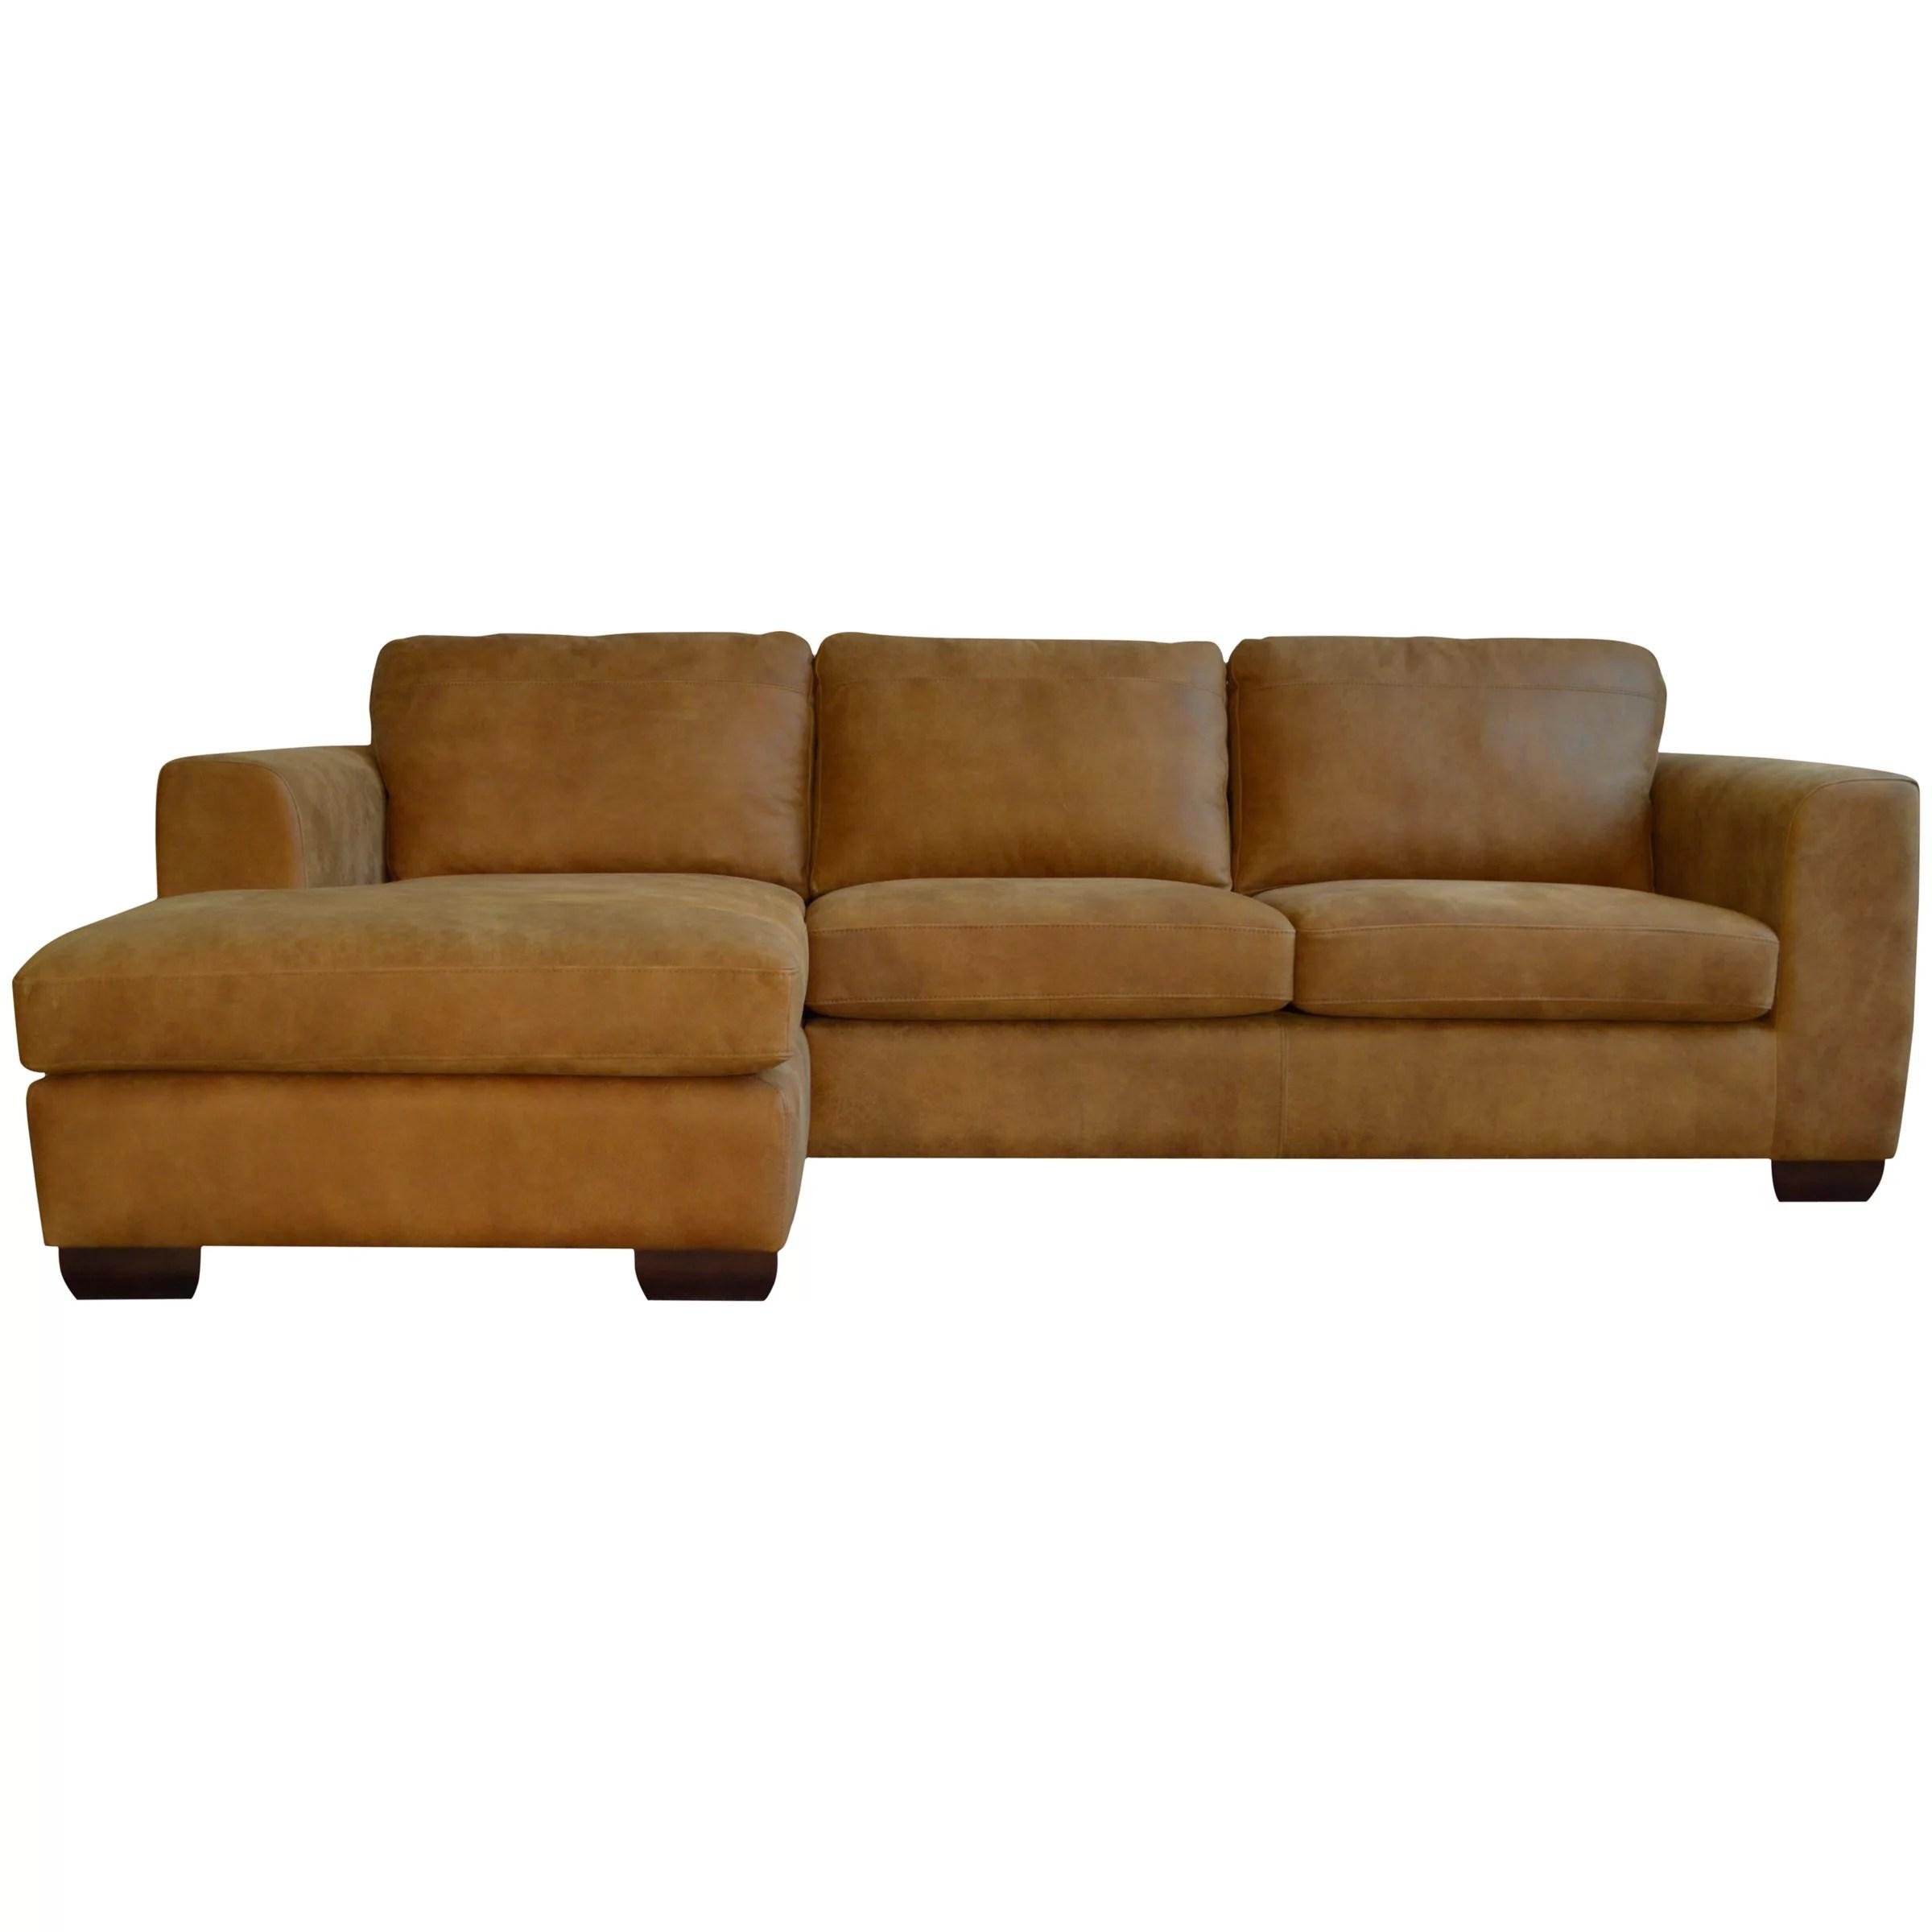 felix leather lh corner chaise sofa furniture village co uk sofas john lewis semi aniline lhf